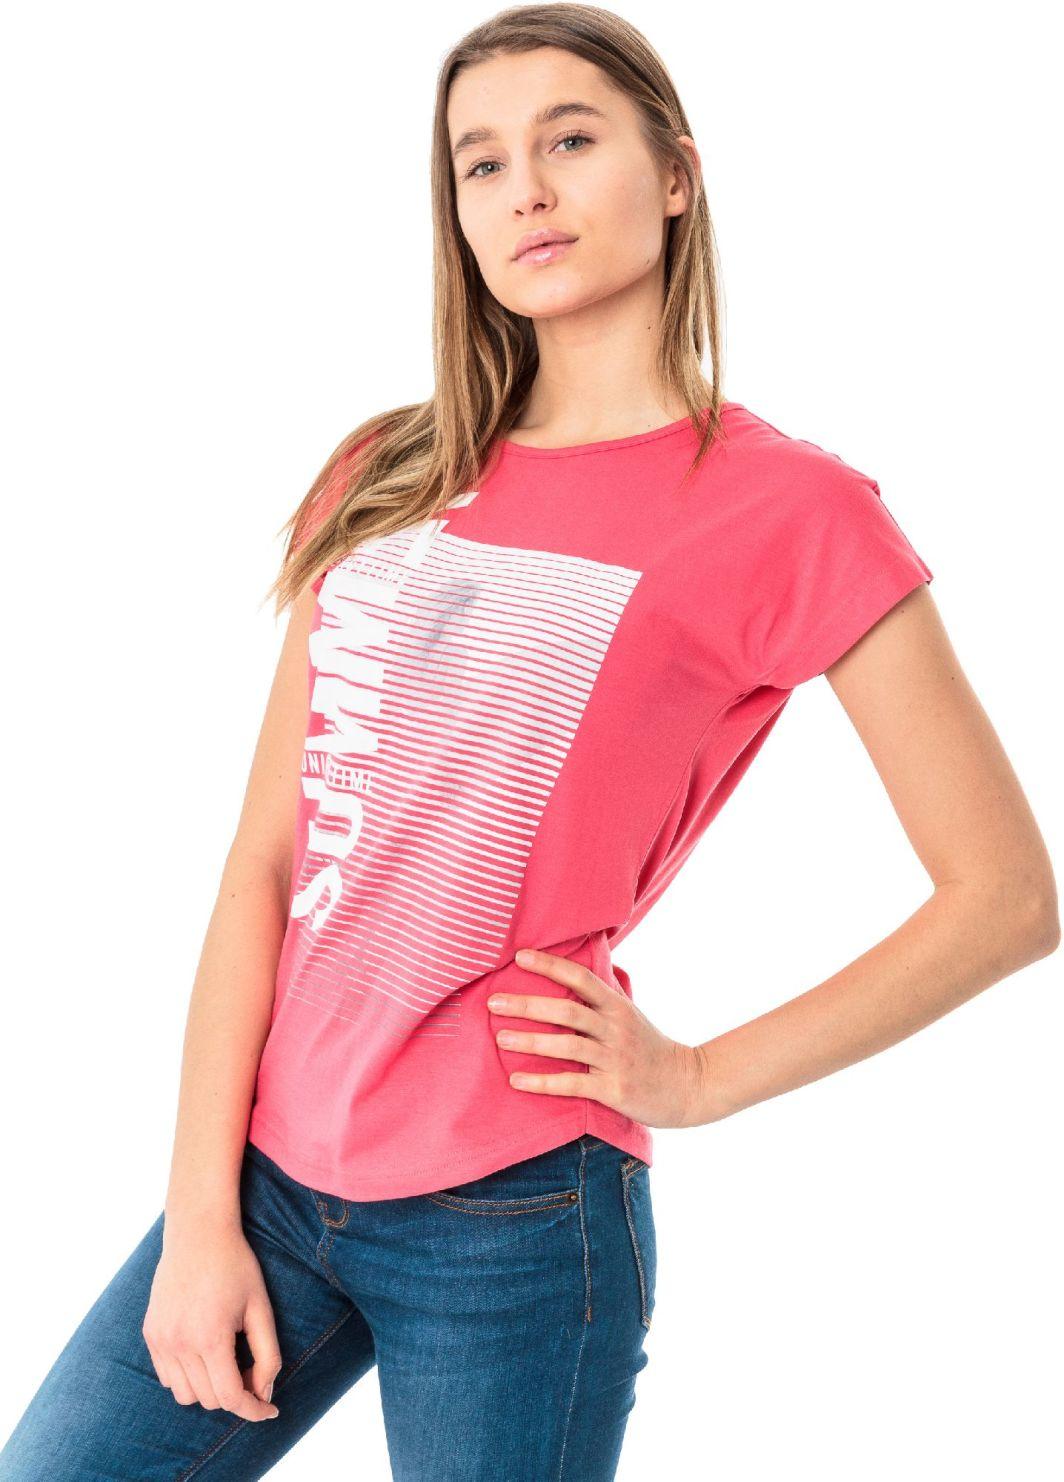 4f Koszulka damska H4L18 TSD016 czerwona r. XL ID produktu: 1690266